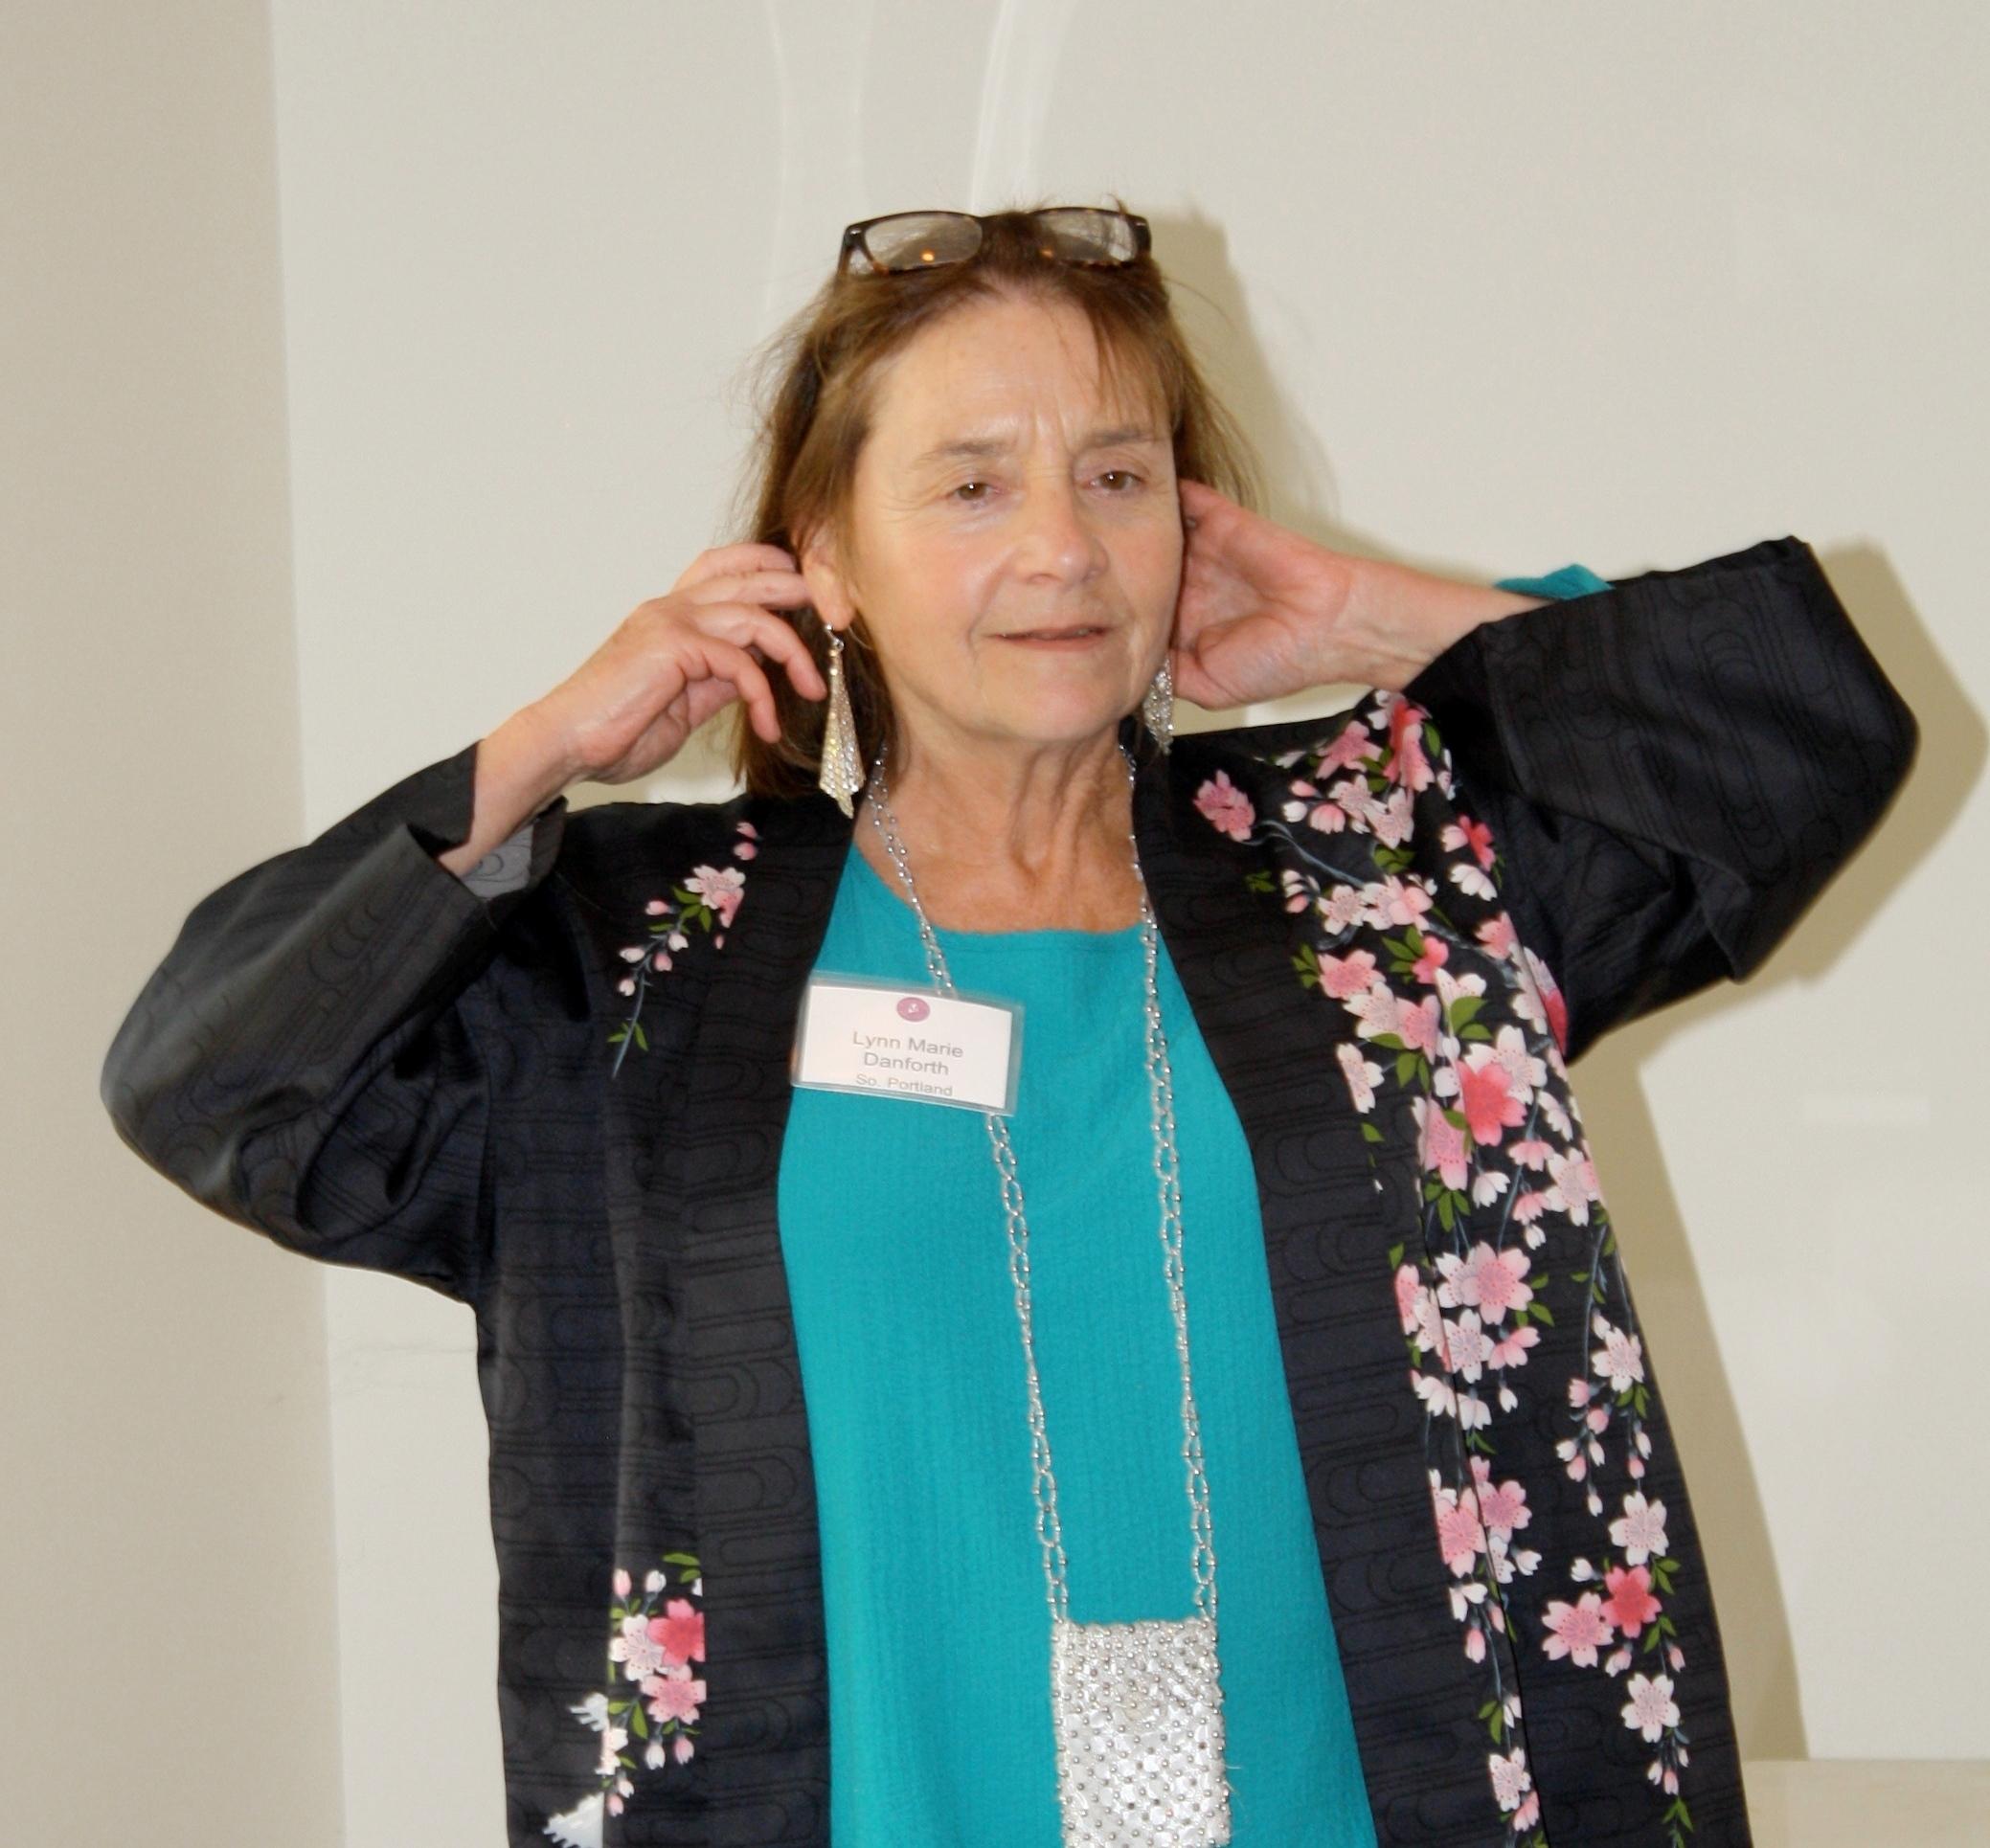 Lynne Marie Danforth Octmtg2017